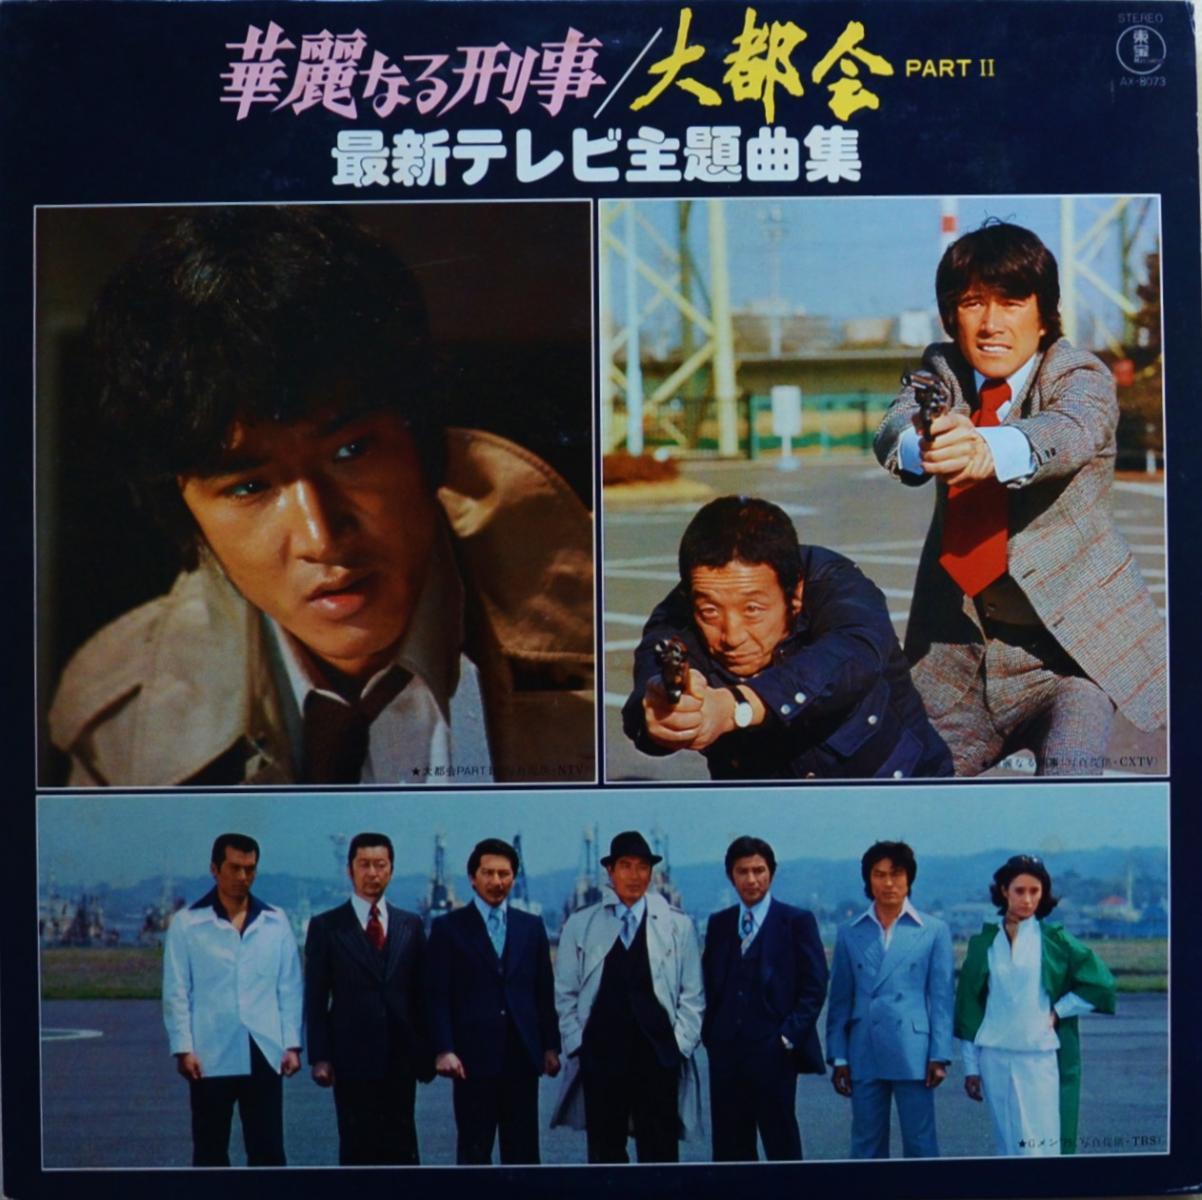 O.S.T. / 華麗なる刑事 / 大都会 PART II (最新テレビ主題曲集) (LP)